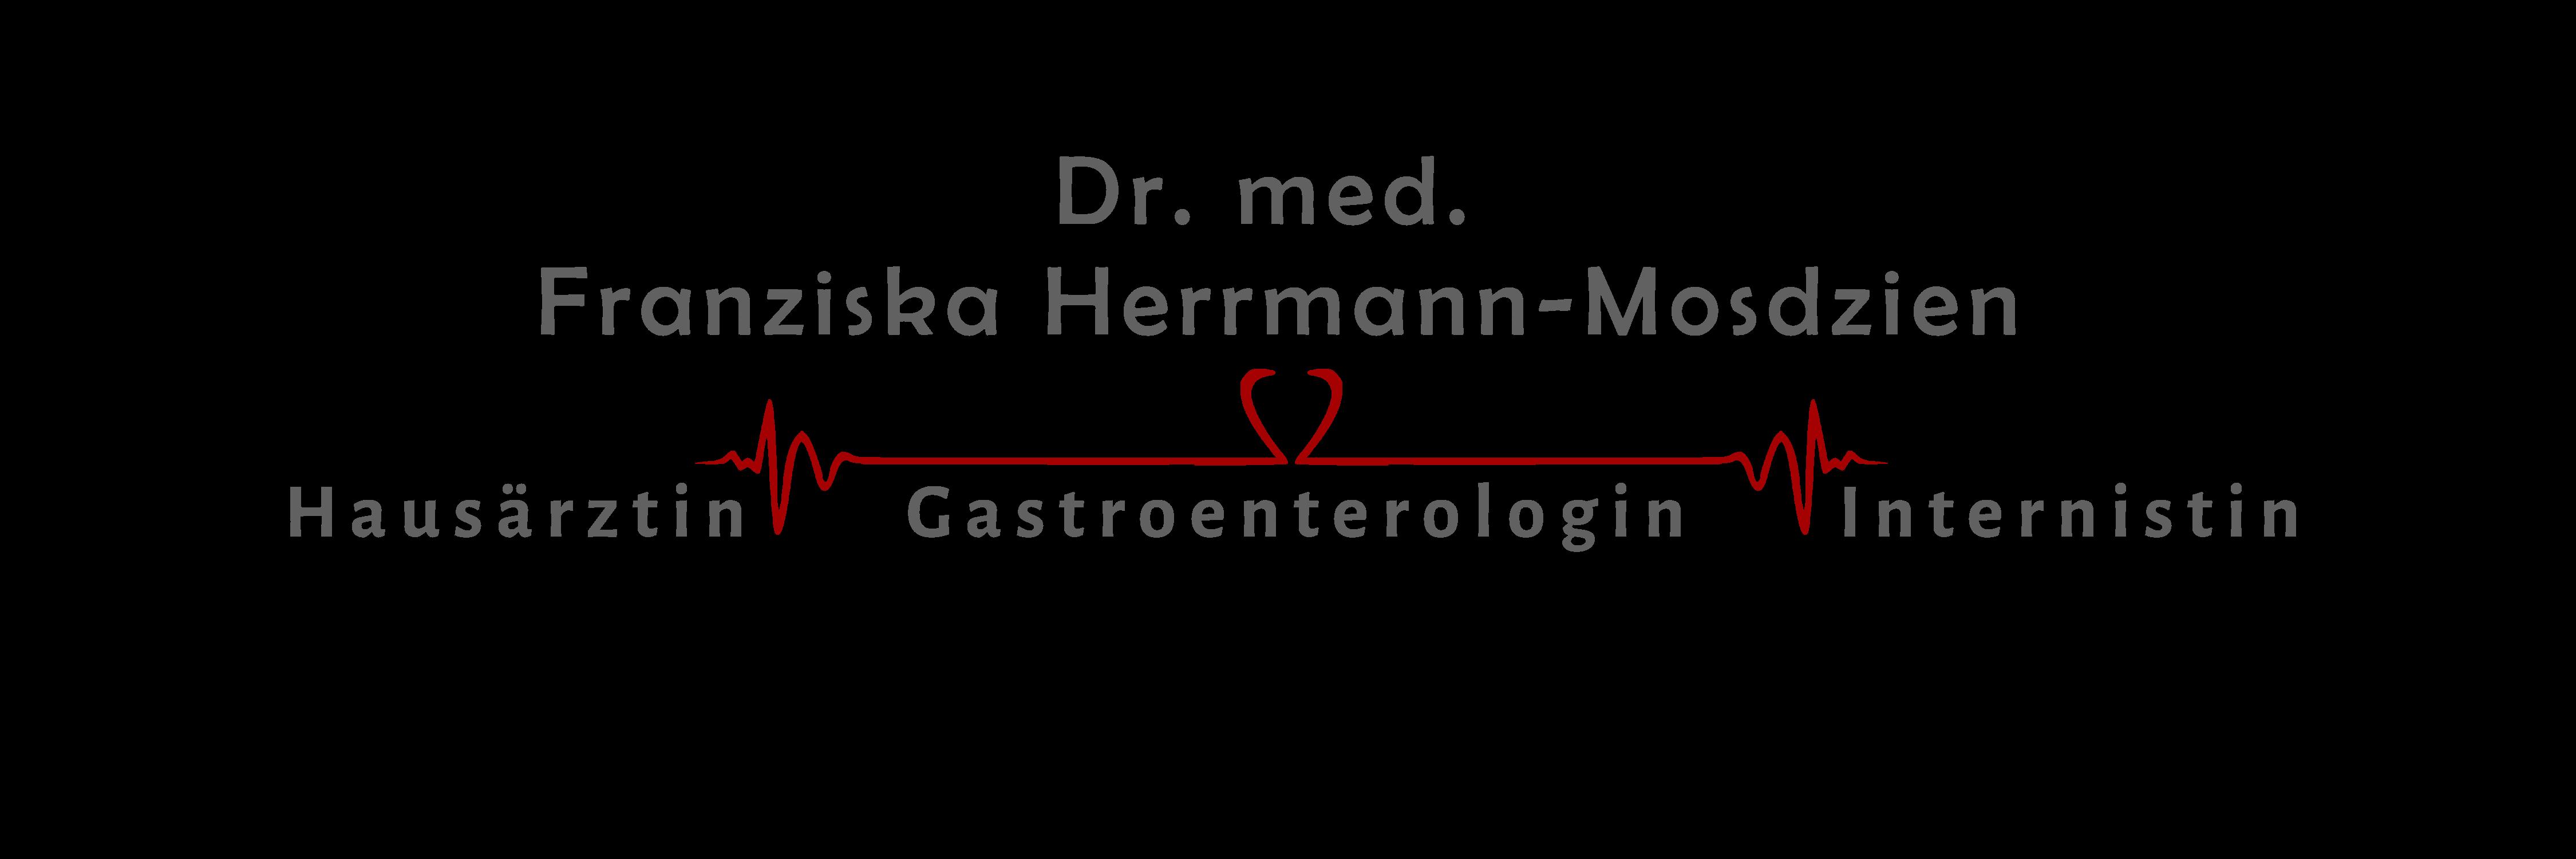 Hausarzt Dr. med Franziska Herrmann-Mosdzien